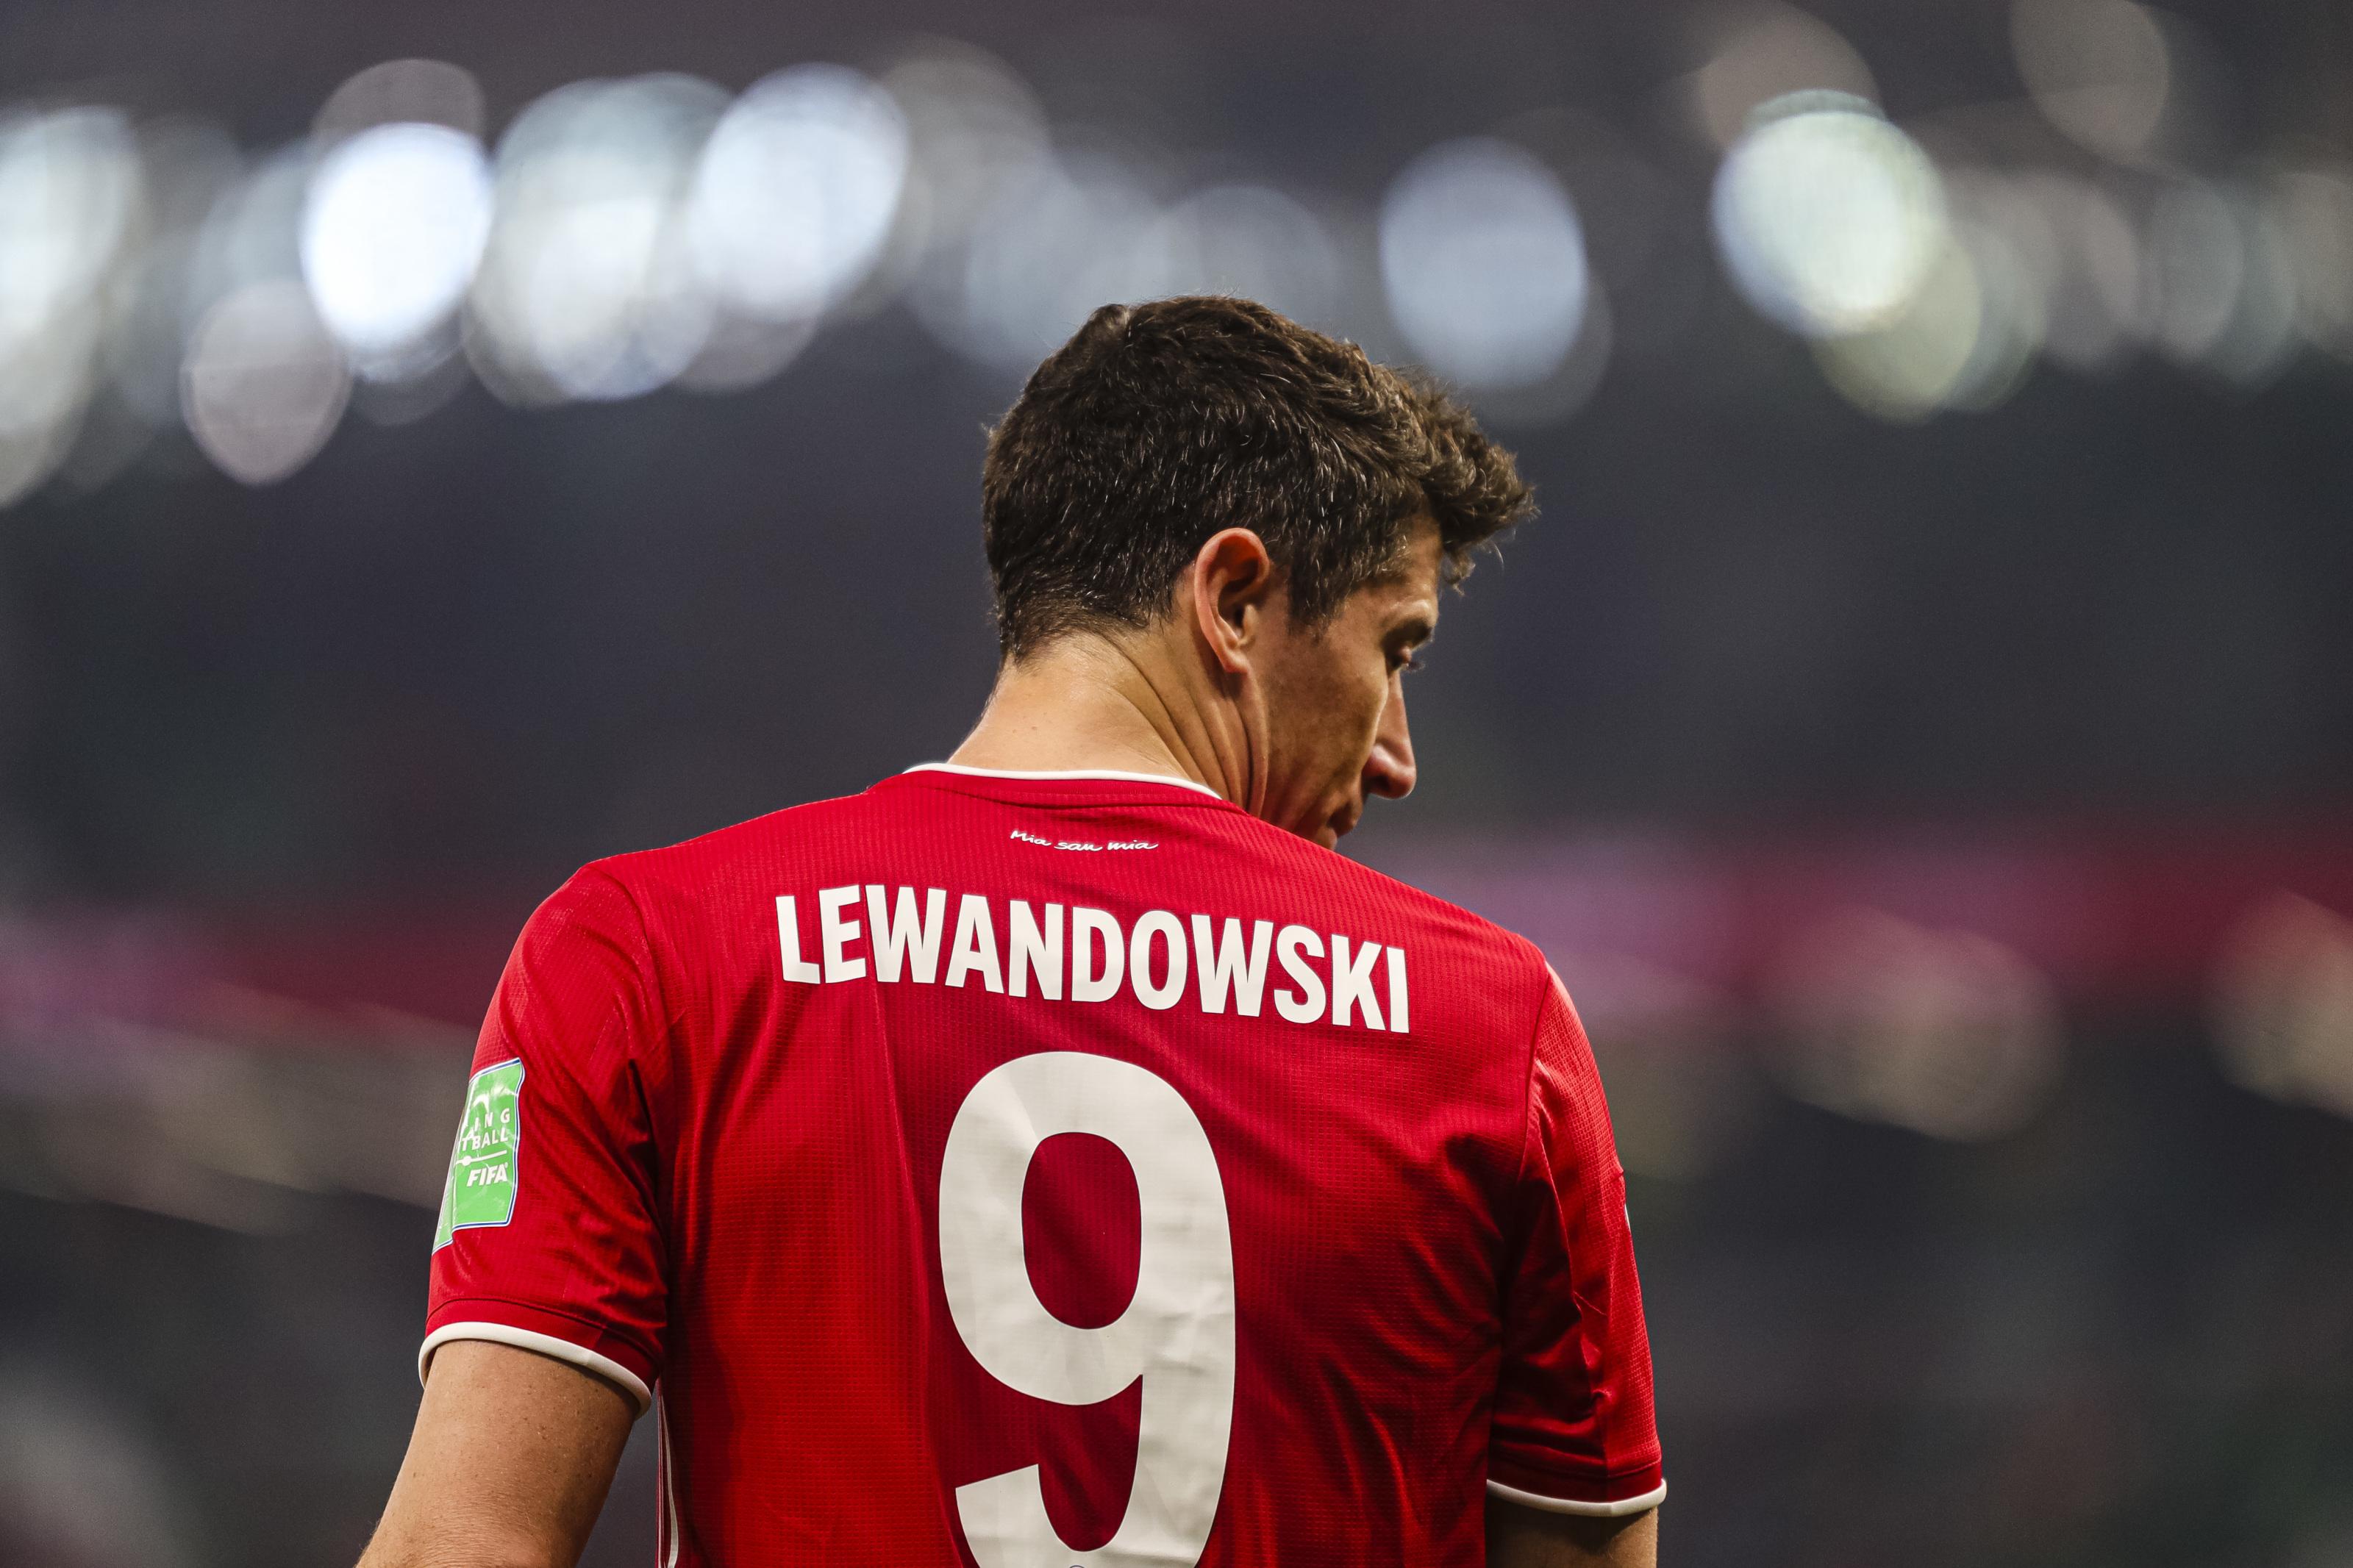 Bayern Munich Lewandowski Leading Race For European Golden Boot